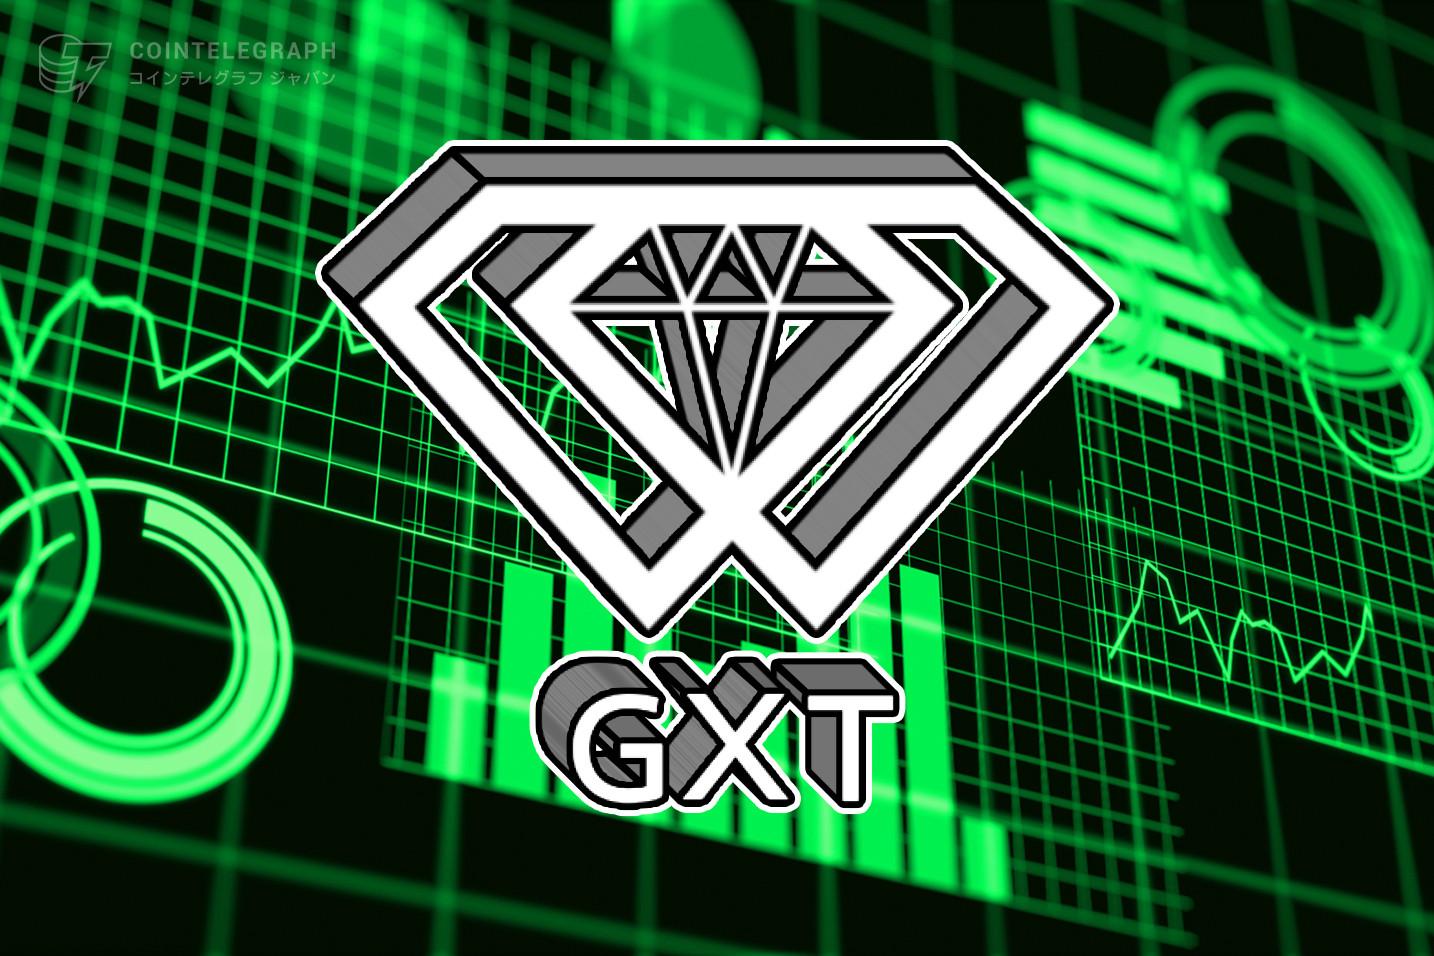 GXT Worldが世界初のダイヤモンドNFT適用プラットフォームを構築